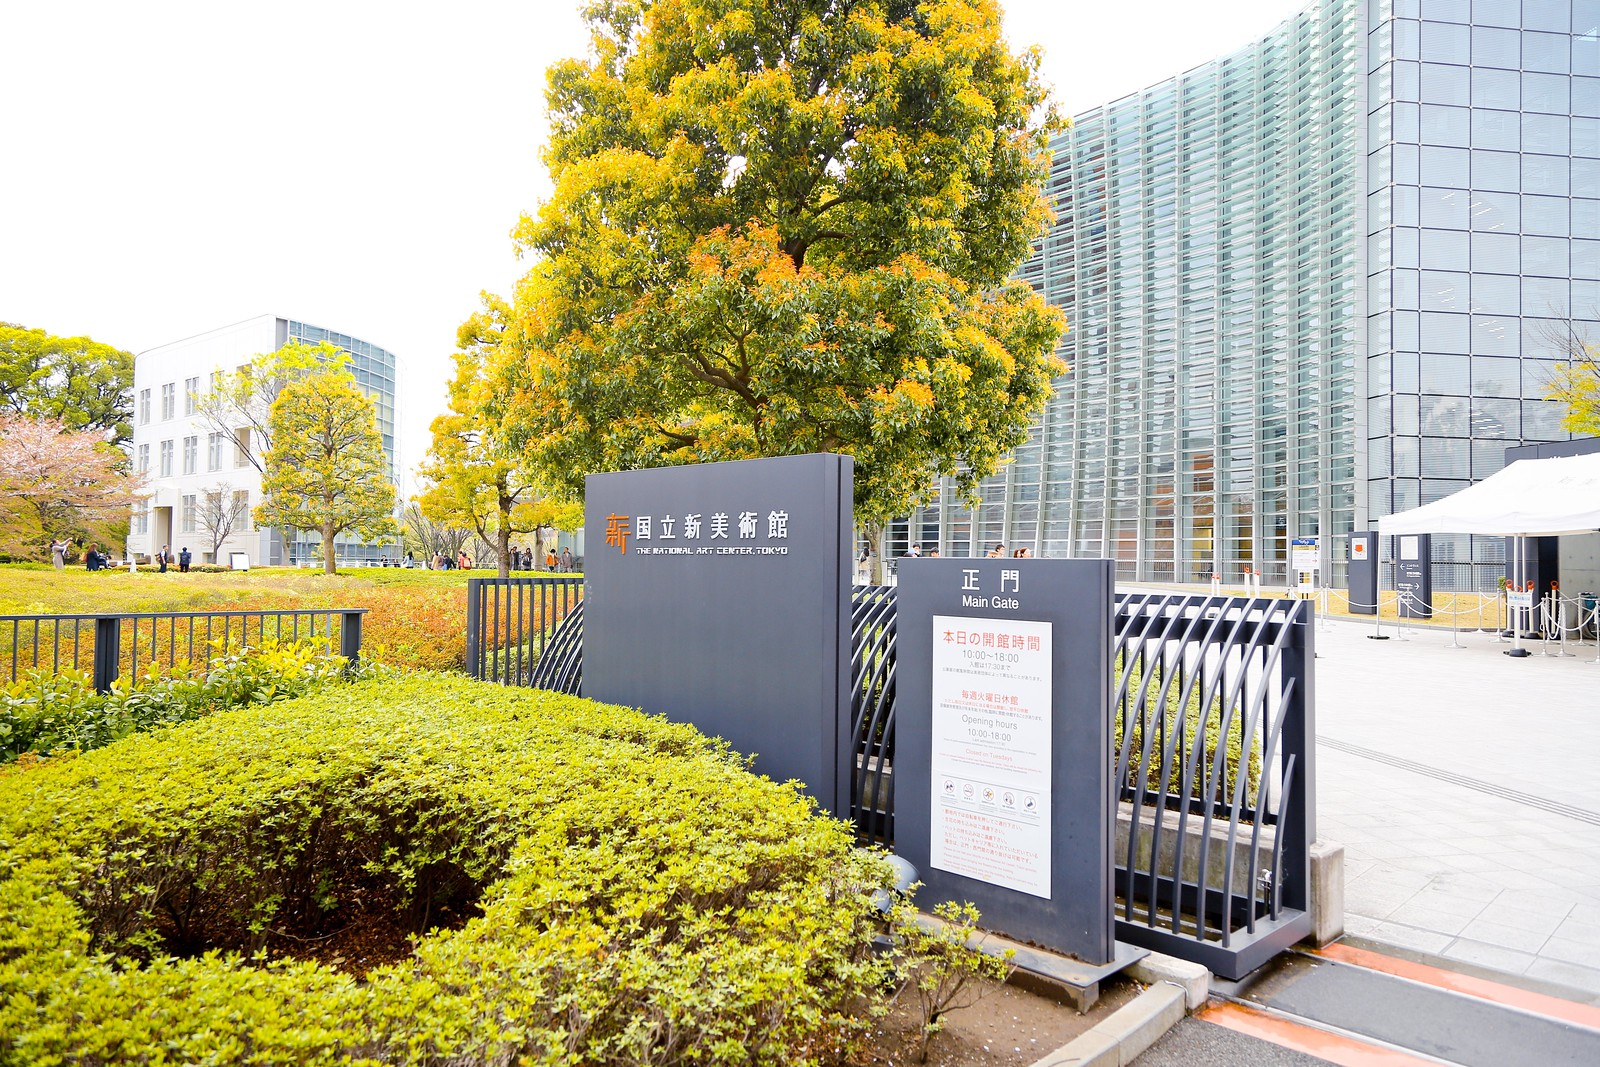 国立新美術館 THE NATIONAL ART CENTER, TOKYO (黑川紀章)